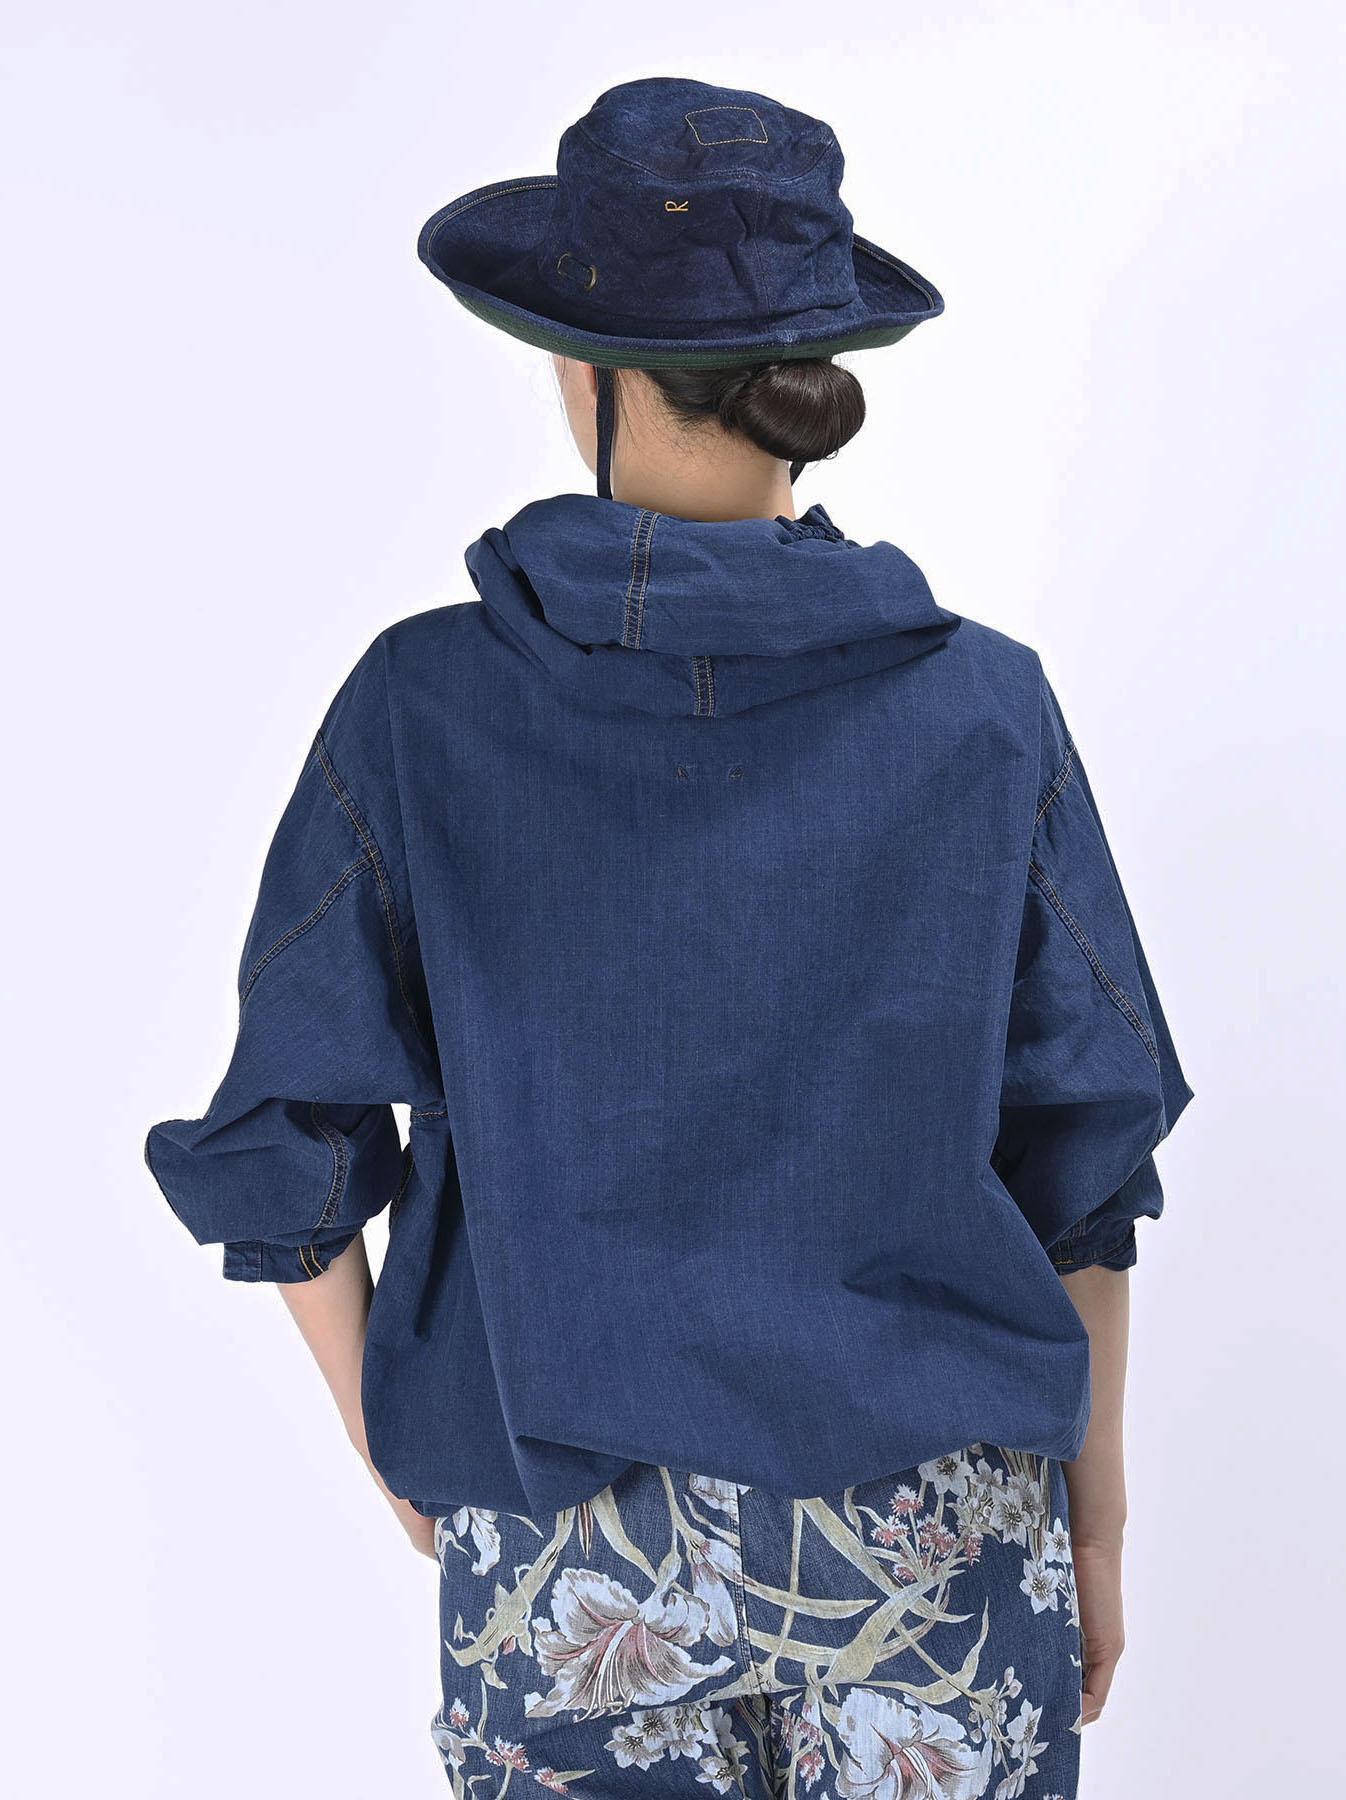 Indigo Tapet Damo Cotton On The Beach Hoodie Shirt-6